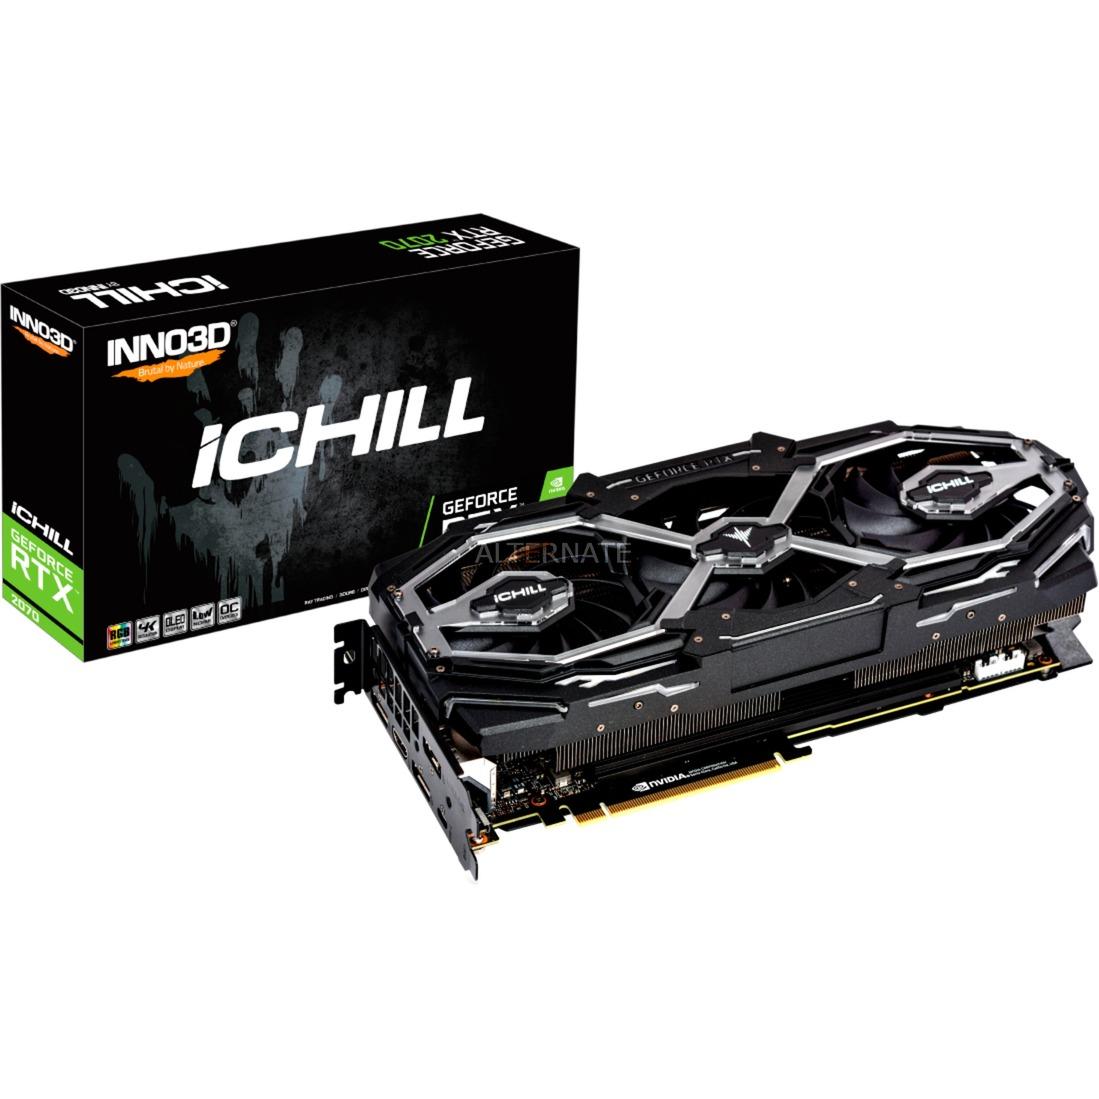 GeForce RTX 2070 SUPER iCHILL X3 JET, Tarjeta gráfica